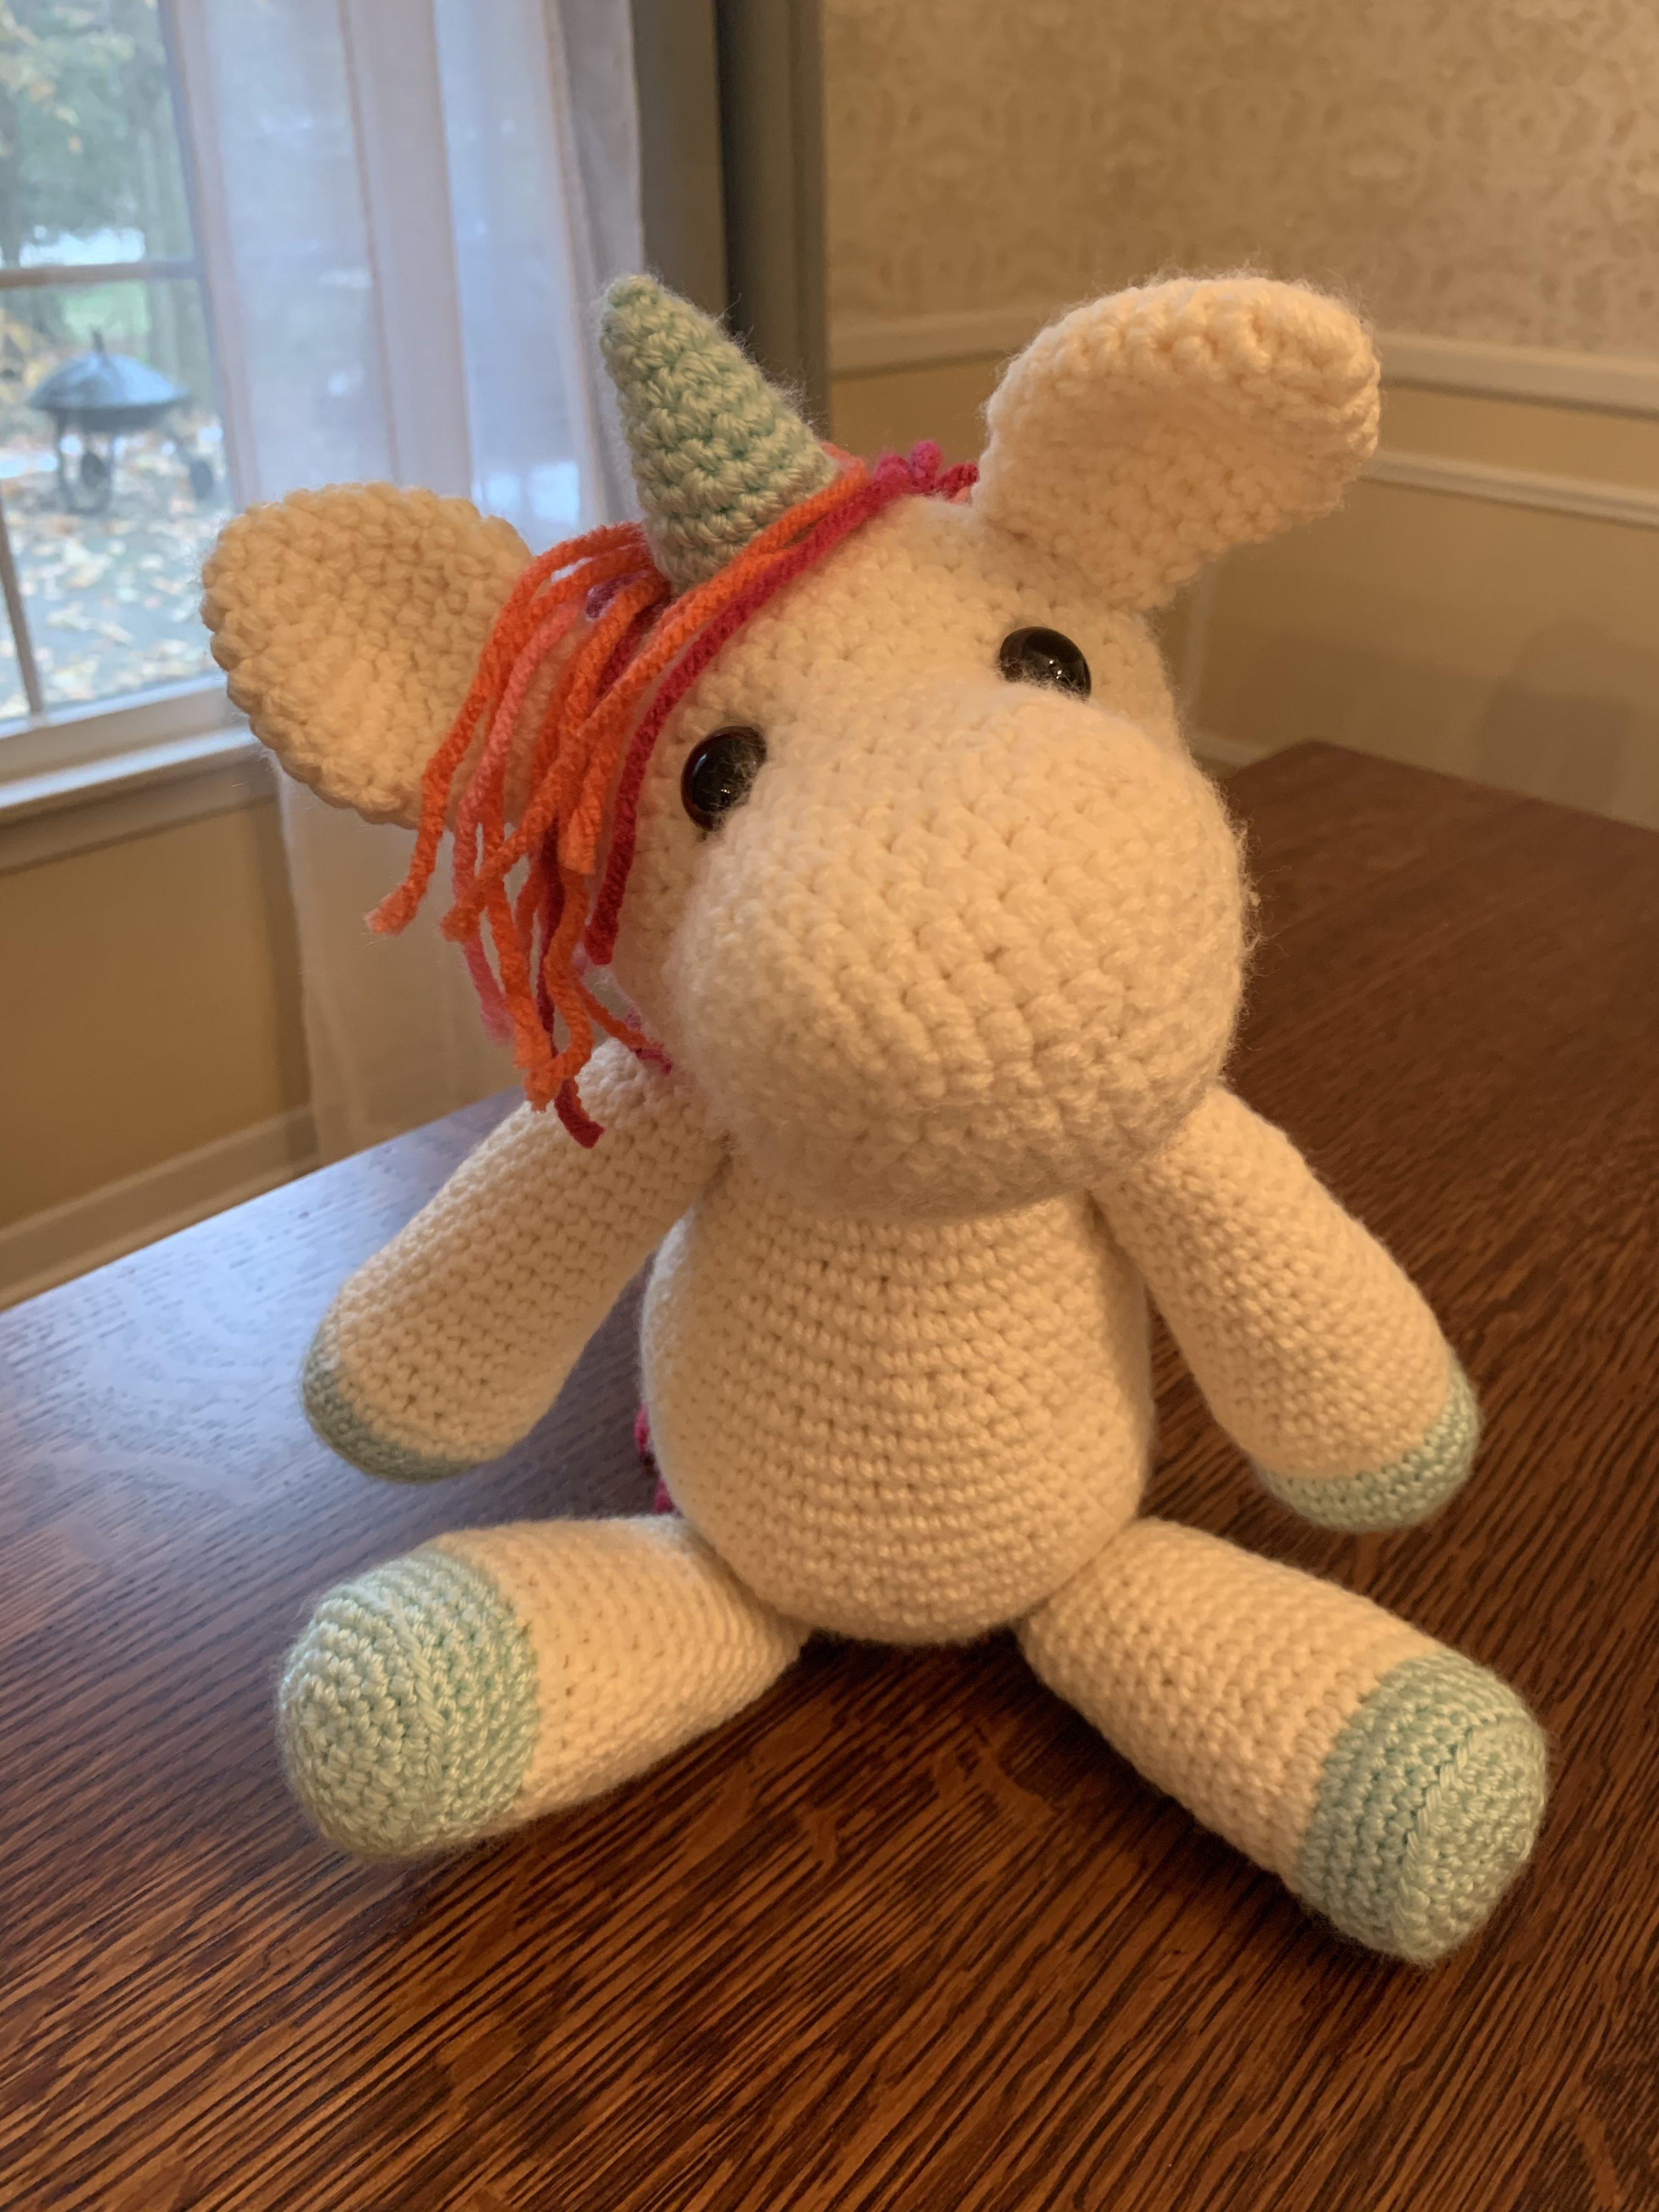 Free Amigurumi Crochet Pattern for Jazzy the Unicorn ⋆ Crochet ... | 4032x3024